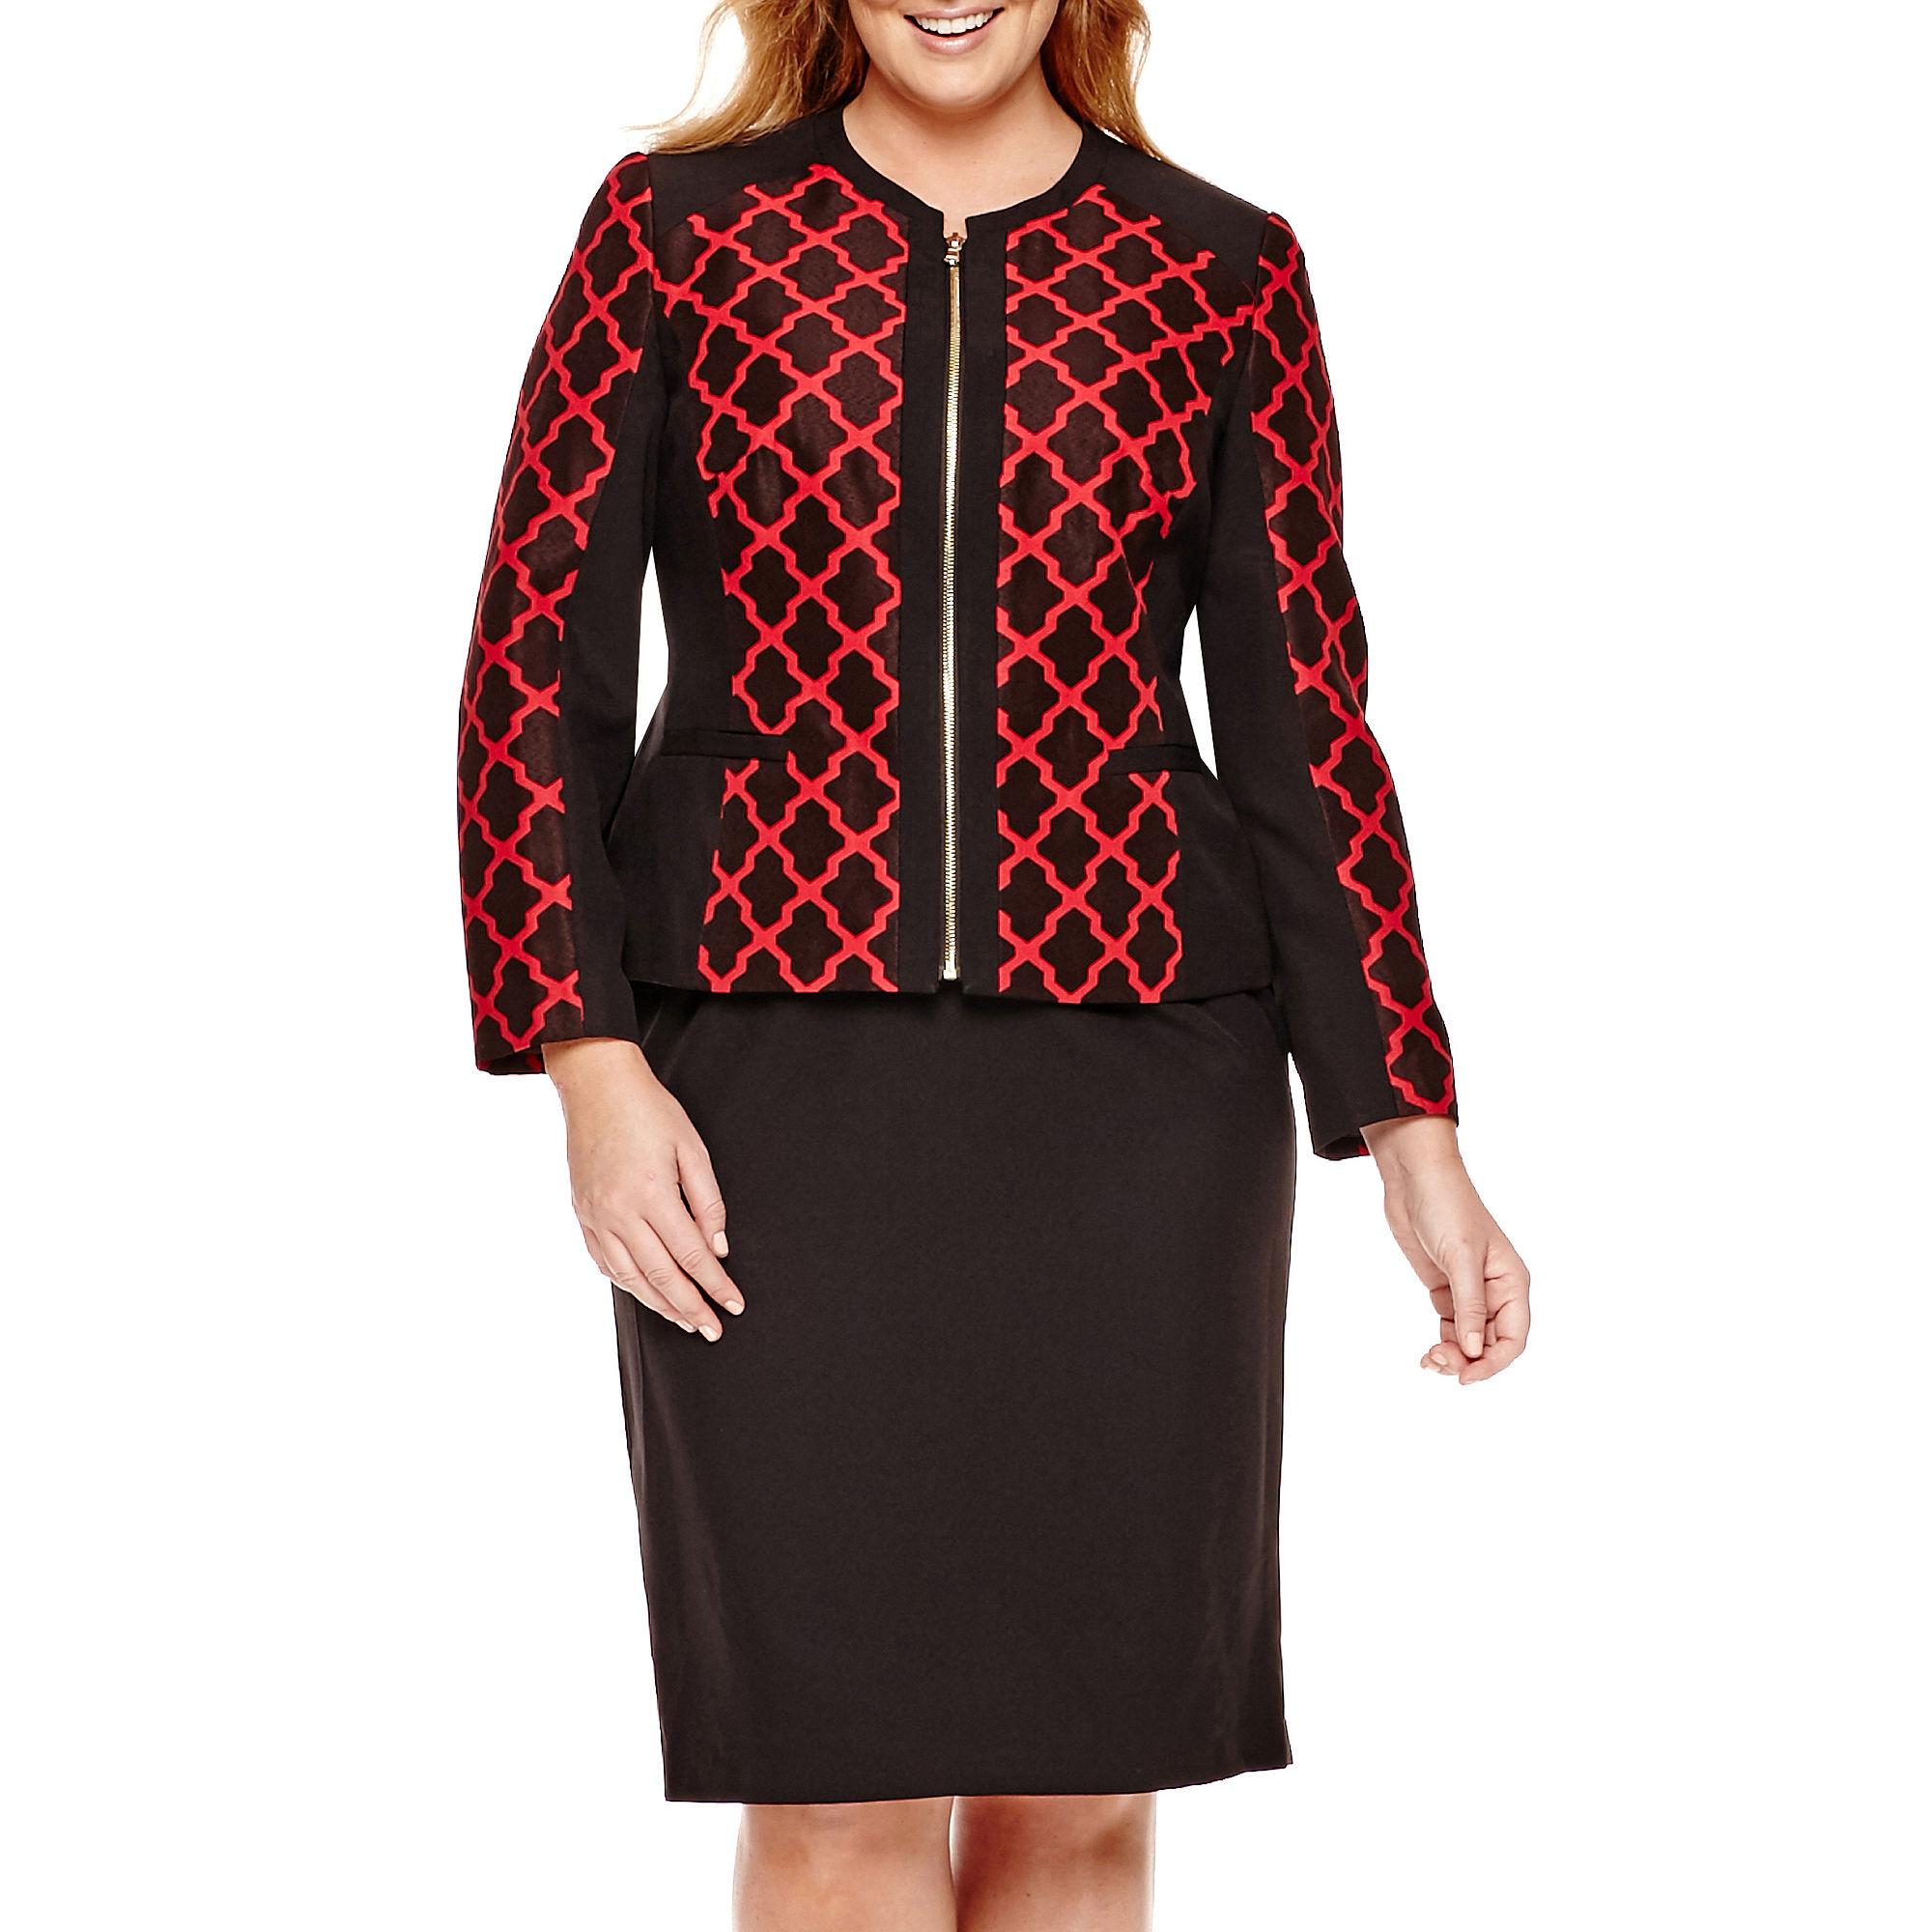 Isabella Long-Sleeve Jacquard Jacket and Skirt Suit - Plus